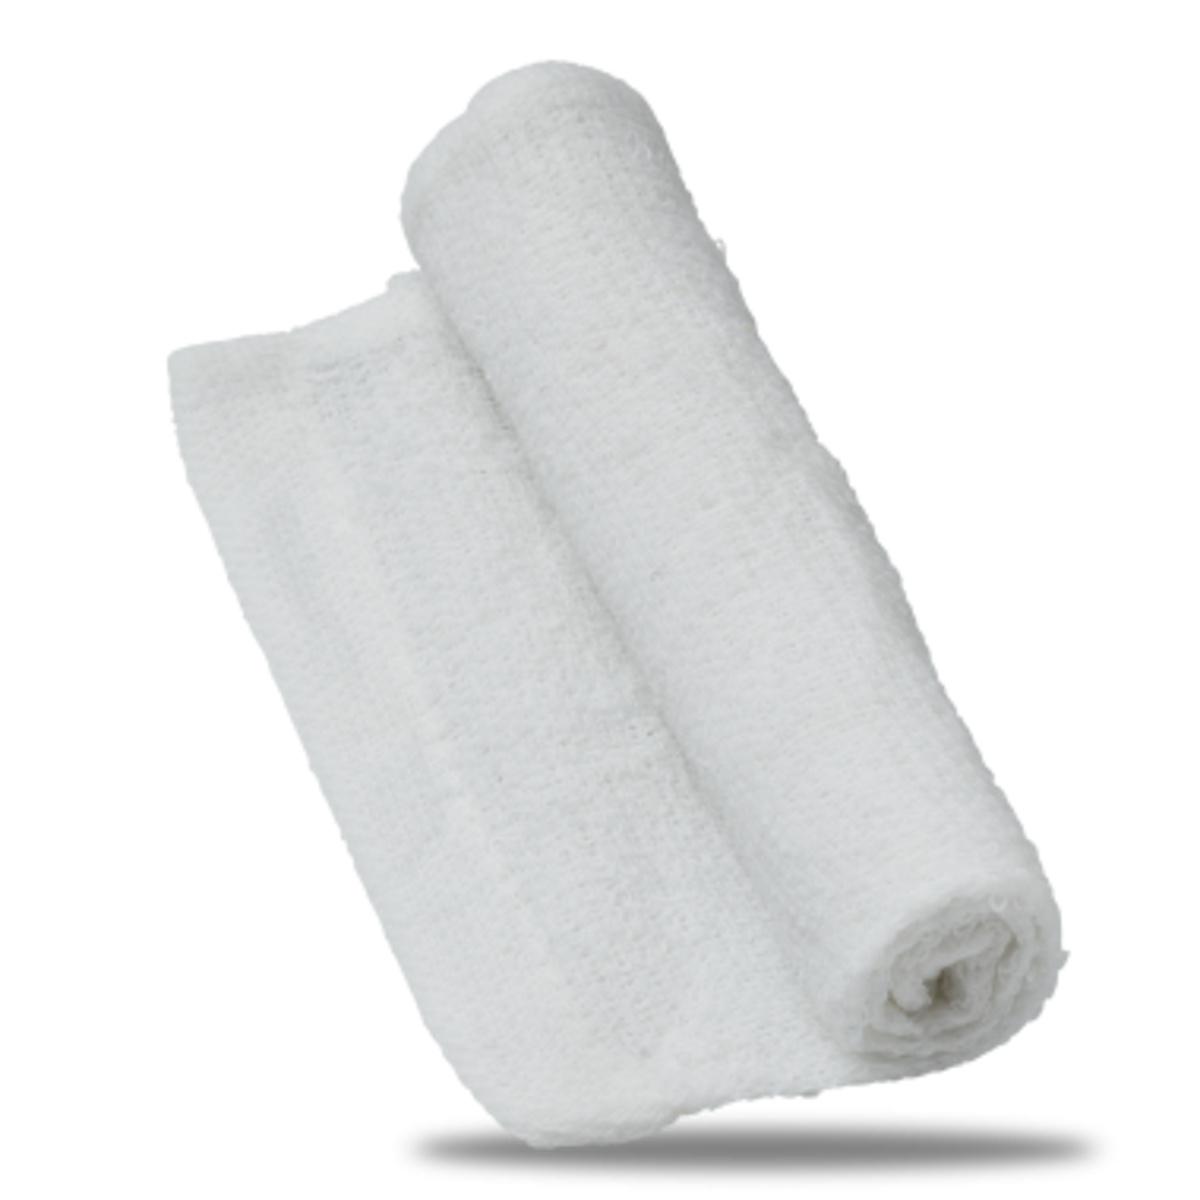 Serviette oshibori blanc tissu 13,20x17,70 cm Oshibori (250 pièces)